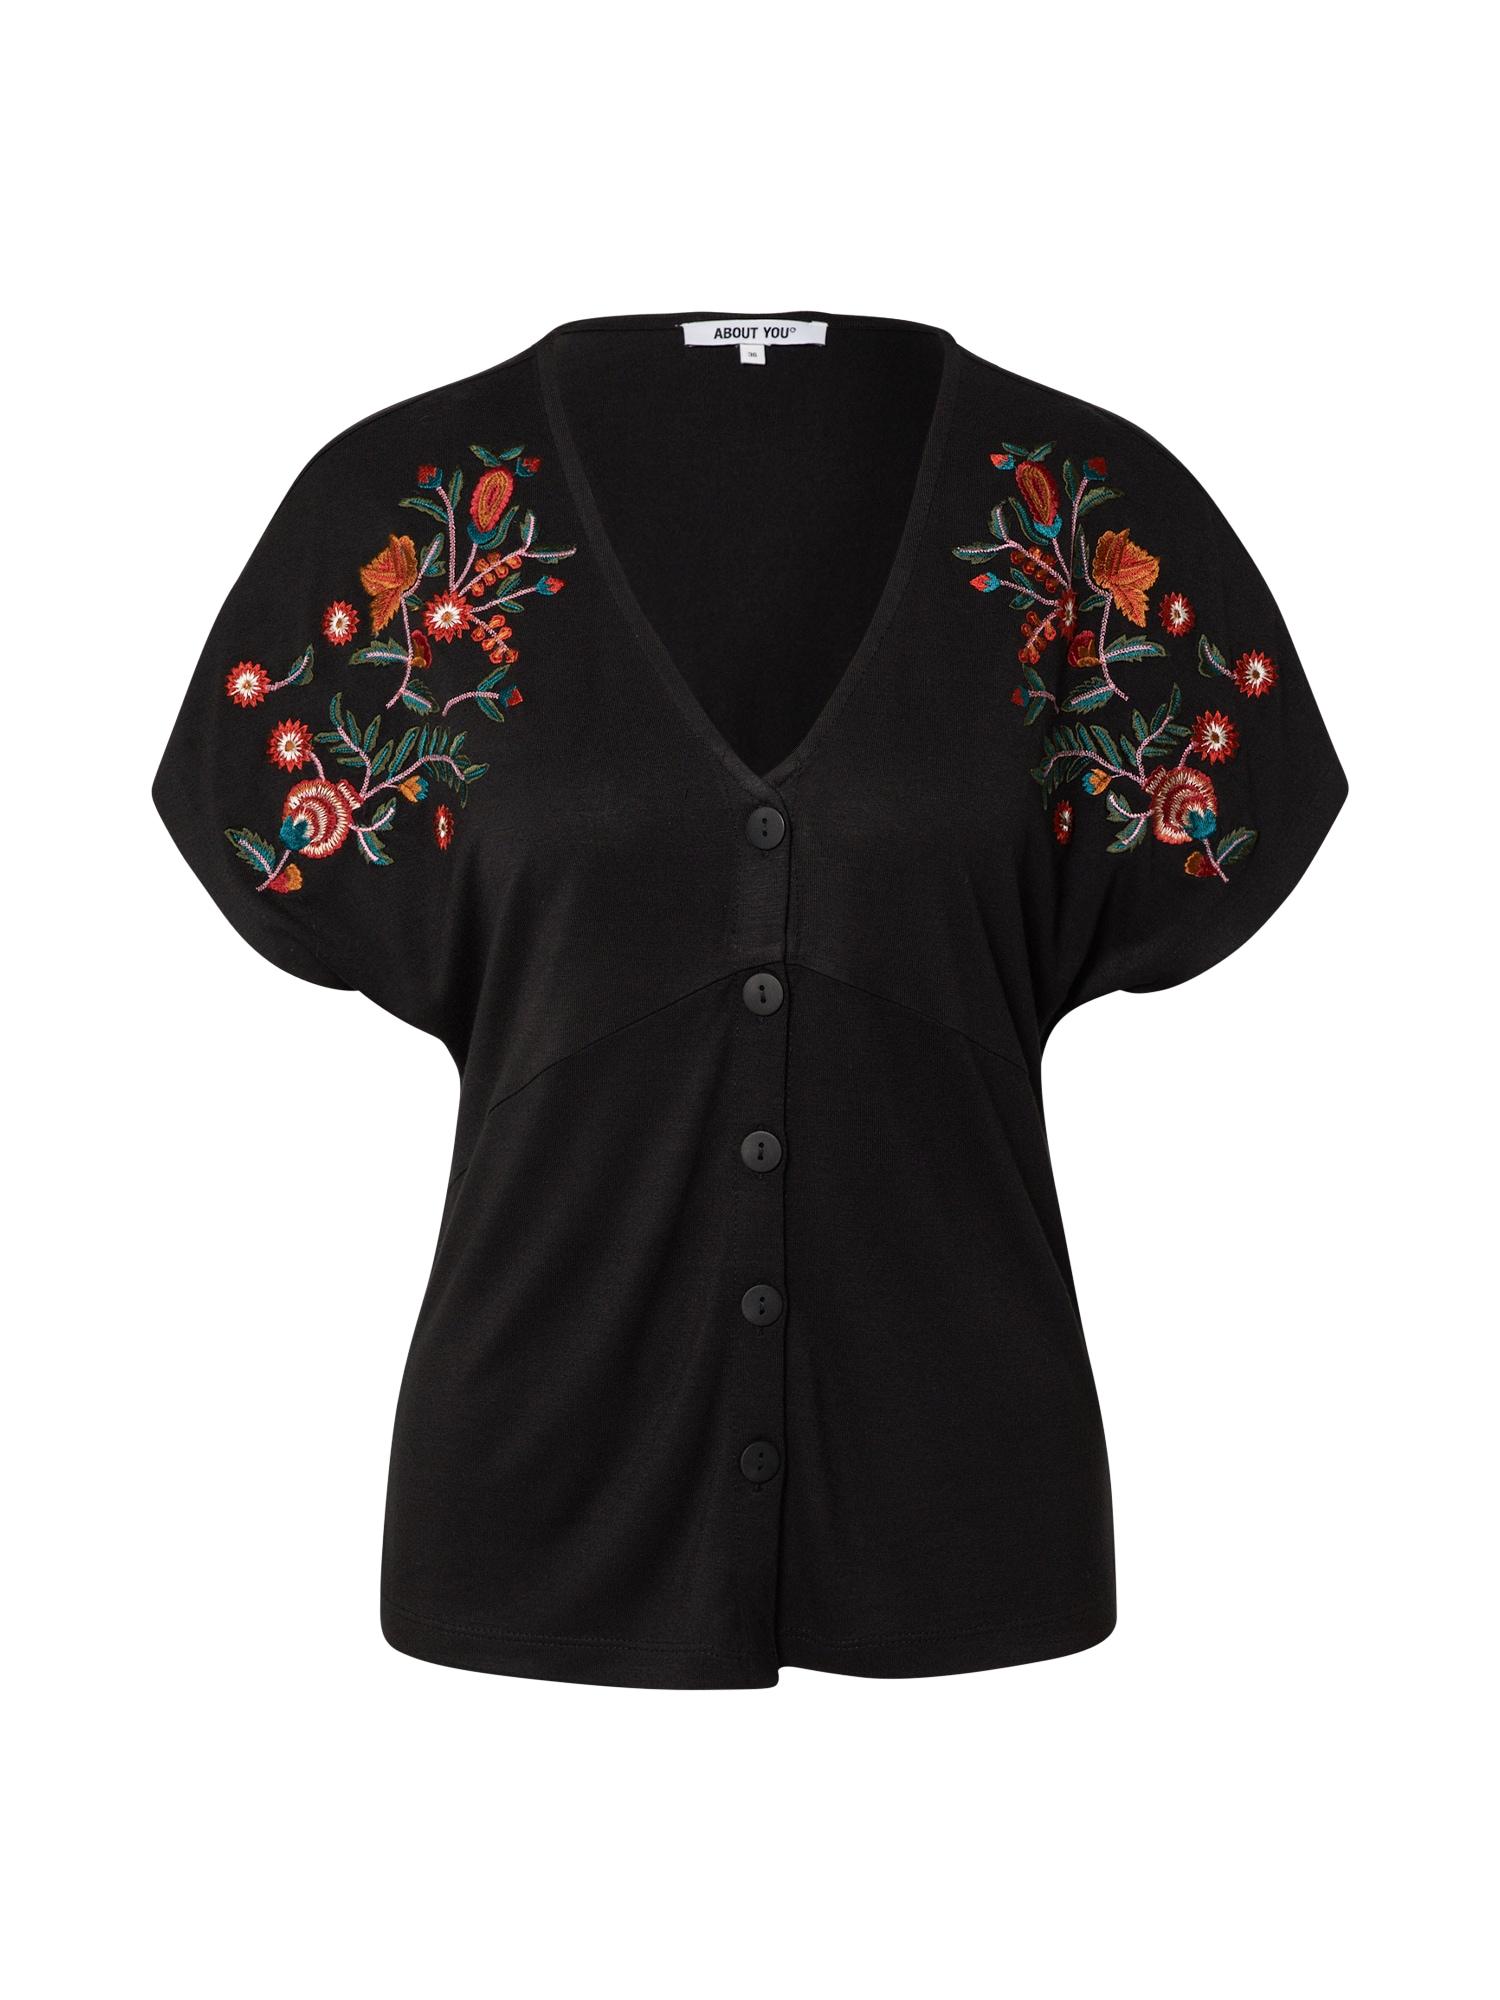 ABOUT YOU Marškinėliai 'Masha' juoda